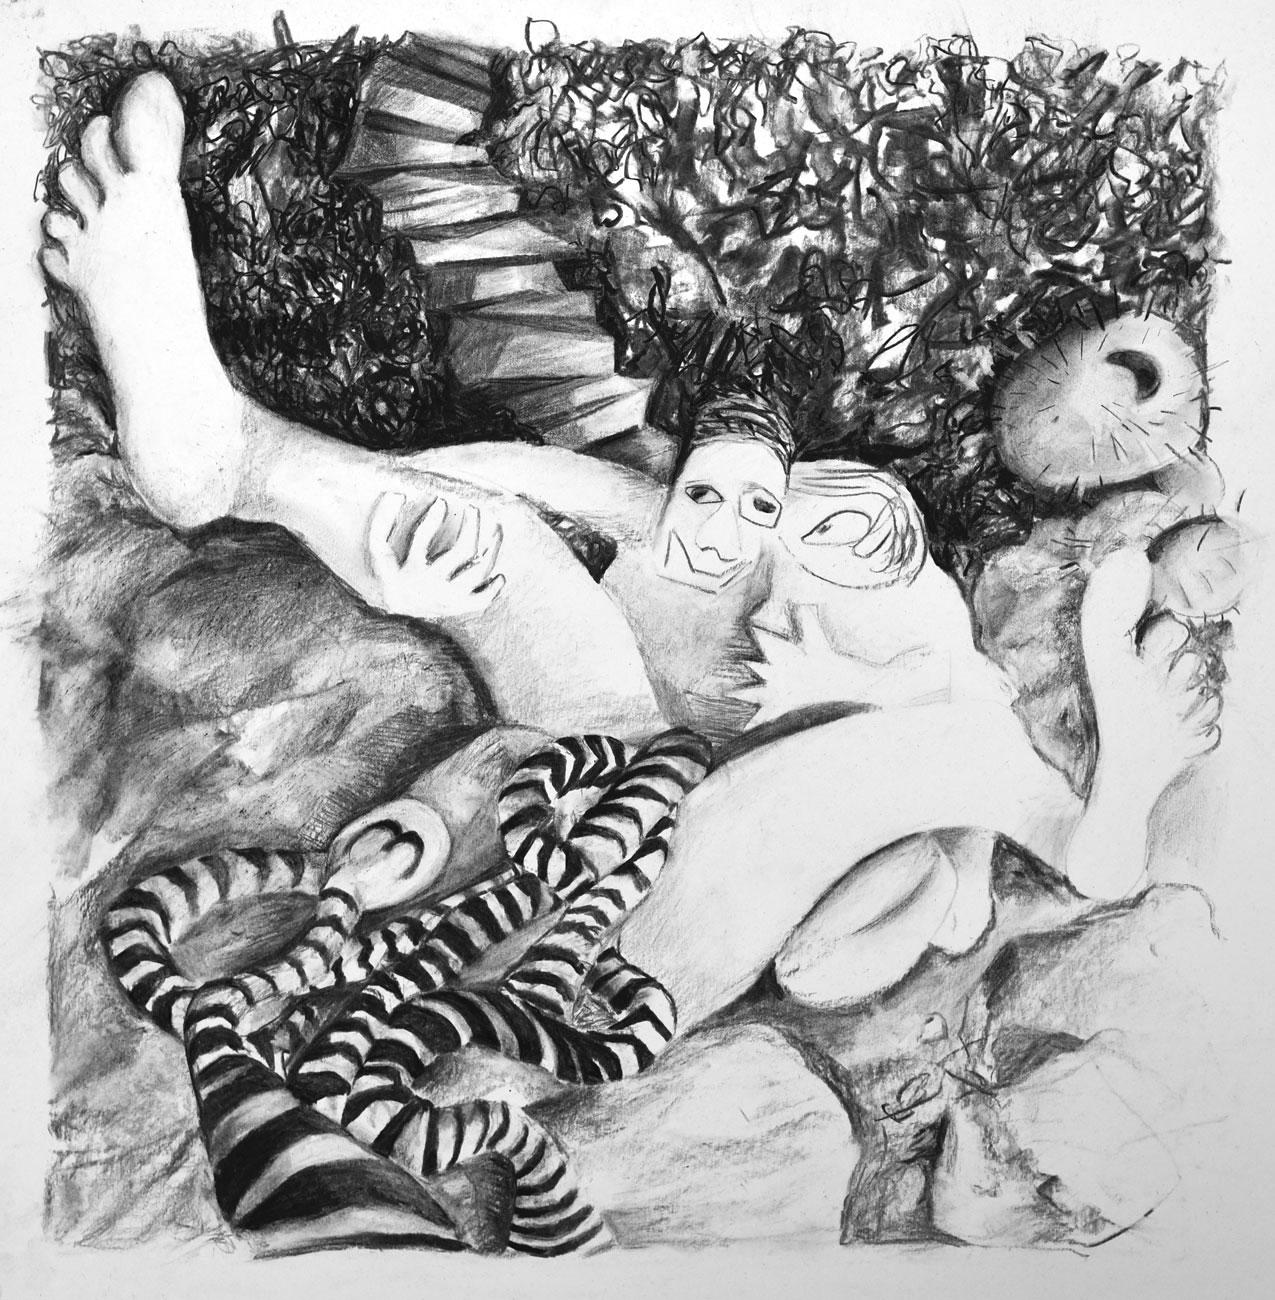 ca-Pique_patrick-simkins_artist_drawing_charcoal-fusain_on_paper_Paris_2021